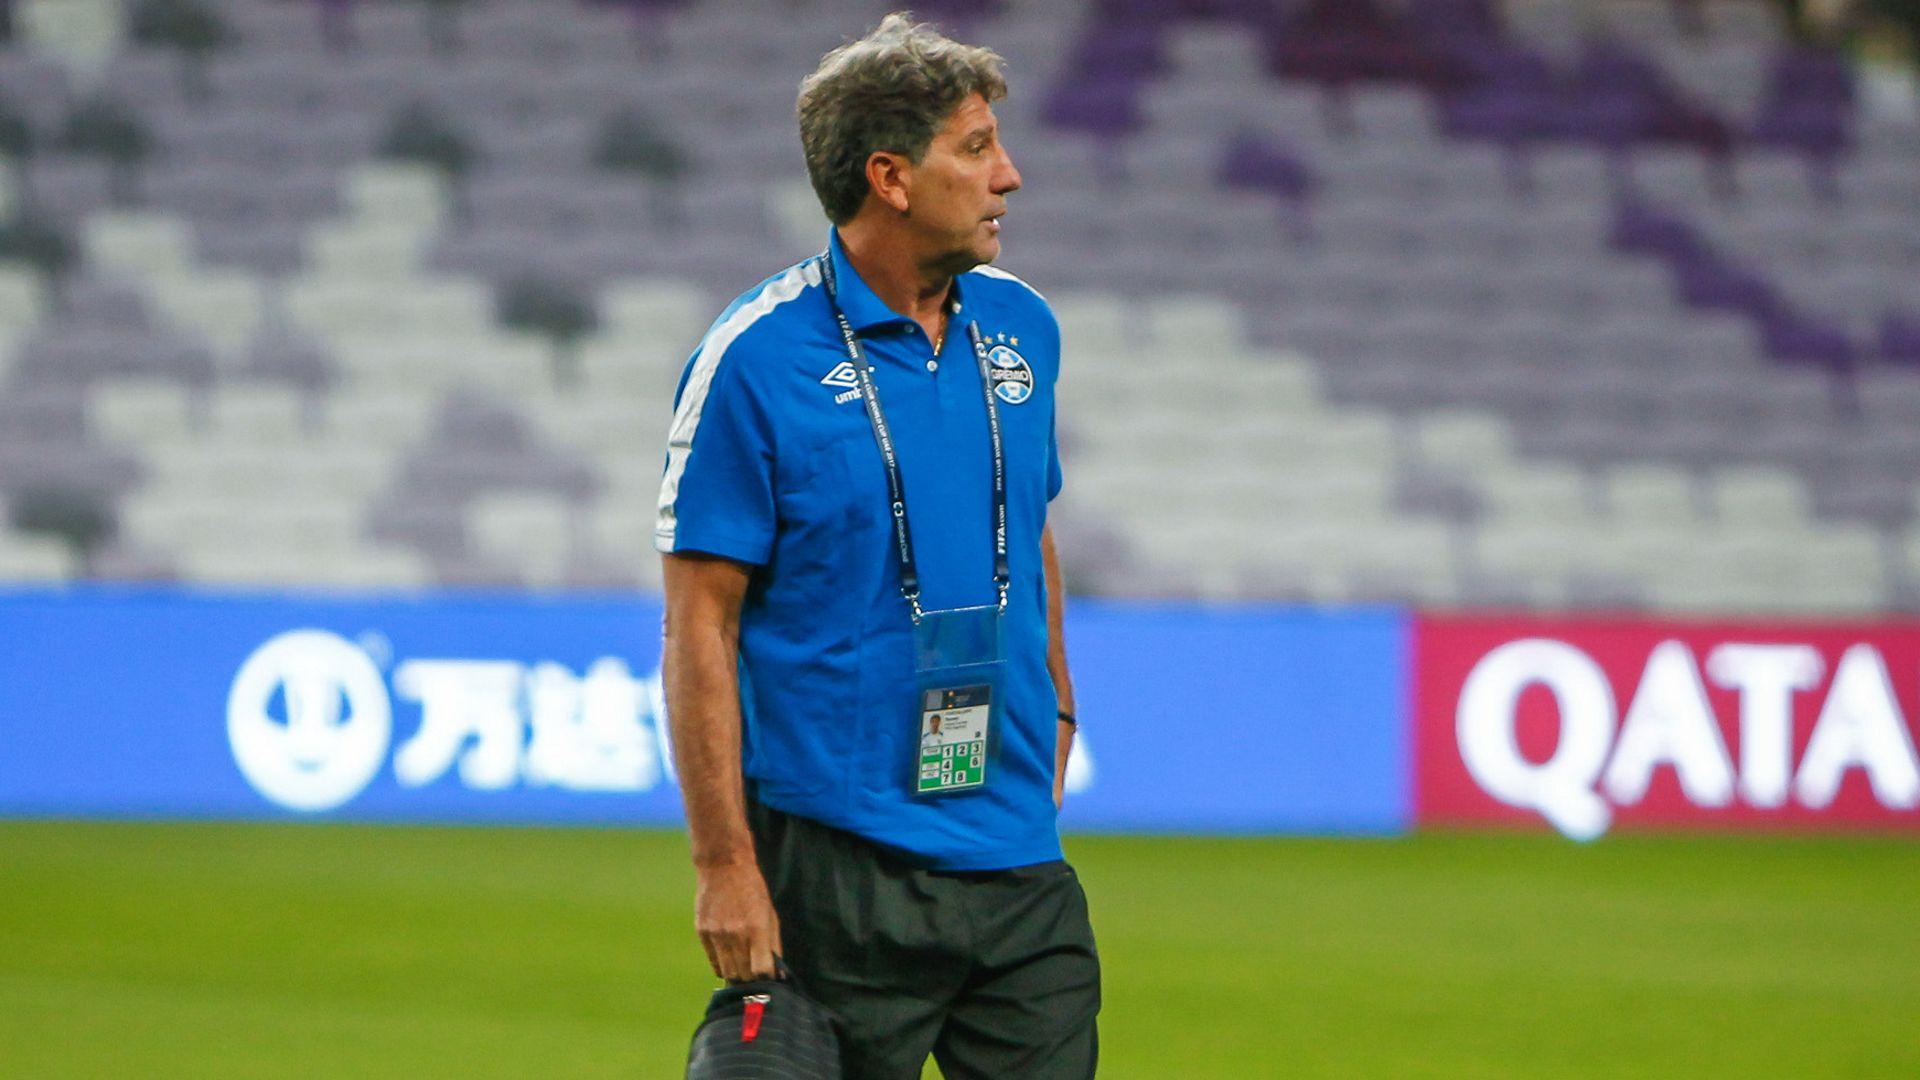 Renato Gaucho Gremio Mundial de Clubes 11122017